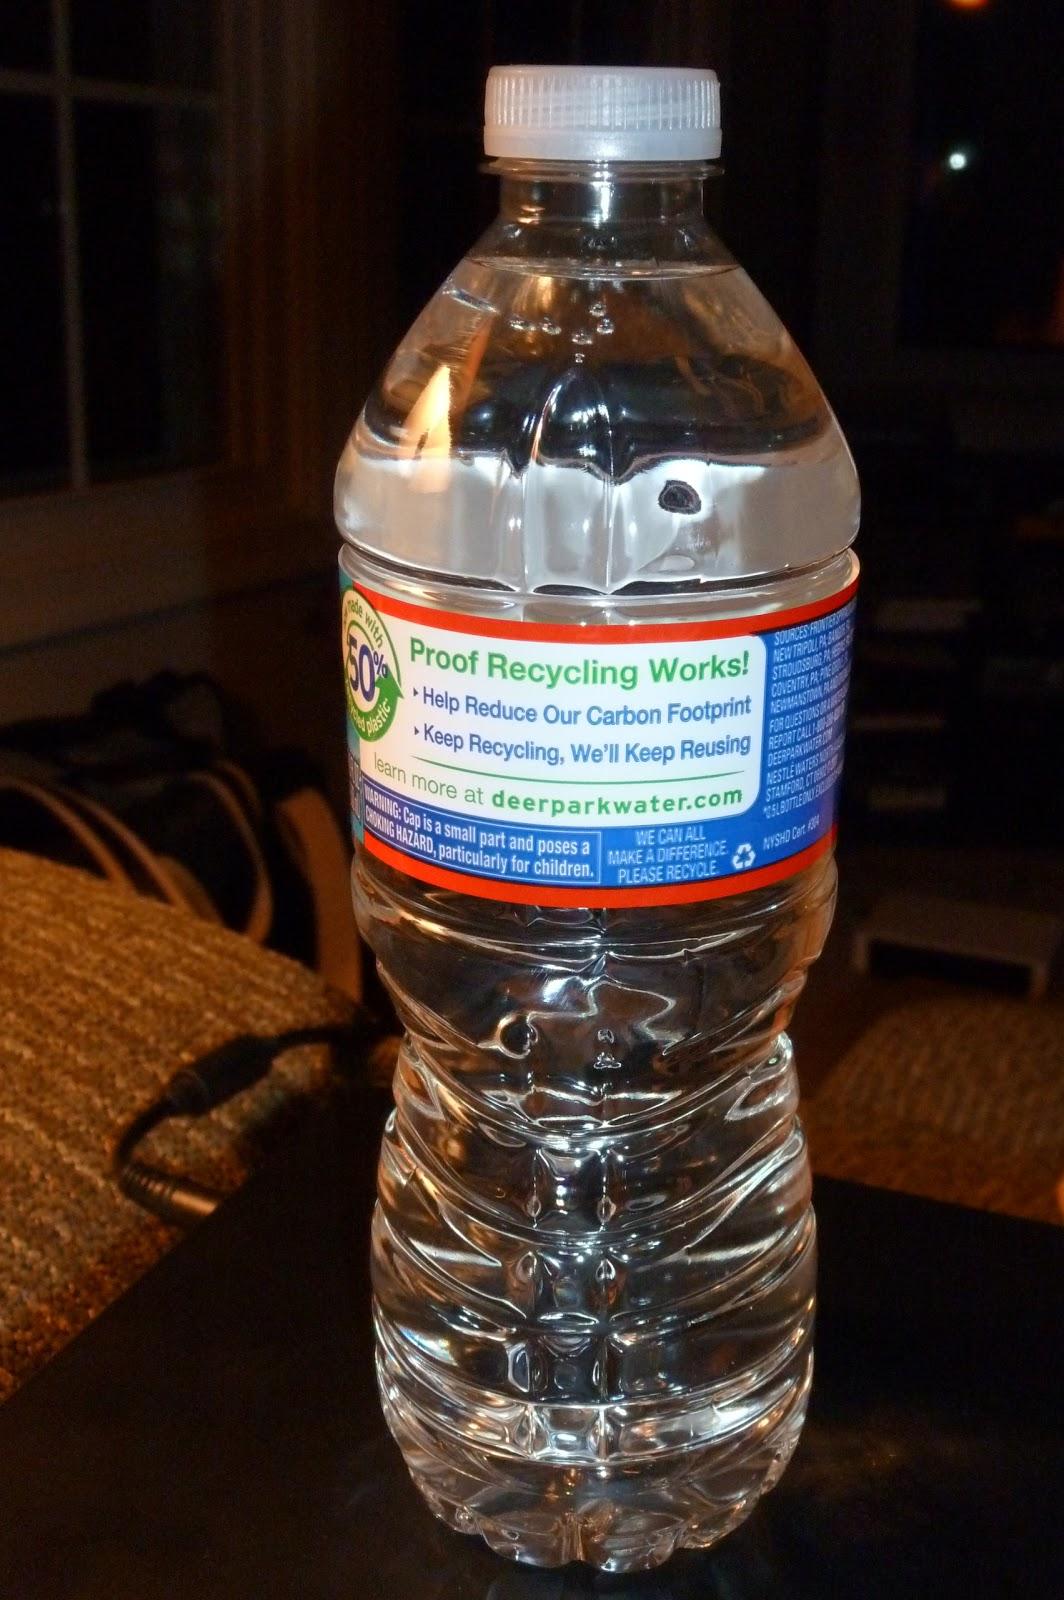 http://1.bp.blogspot.com/-8egw4sM7rqI/TnLEQX7htuI/AAAAAAAAAQU/dyK0pq3636c/s1600/Bottled+Water.jpg